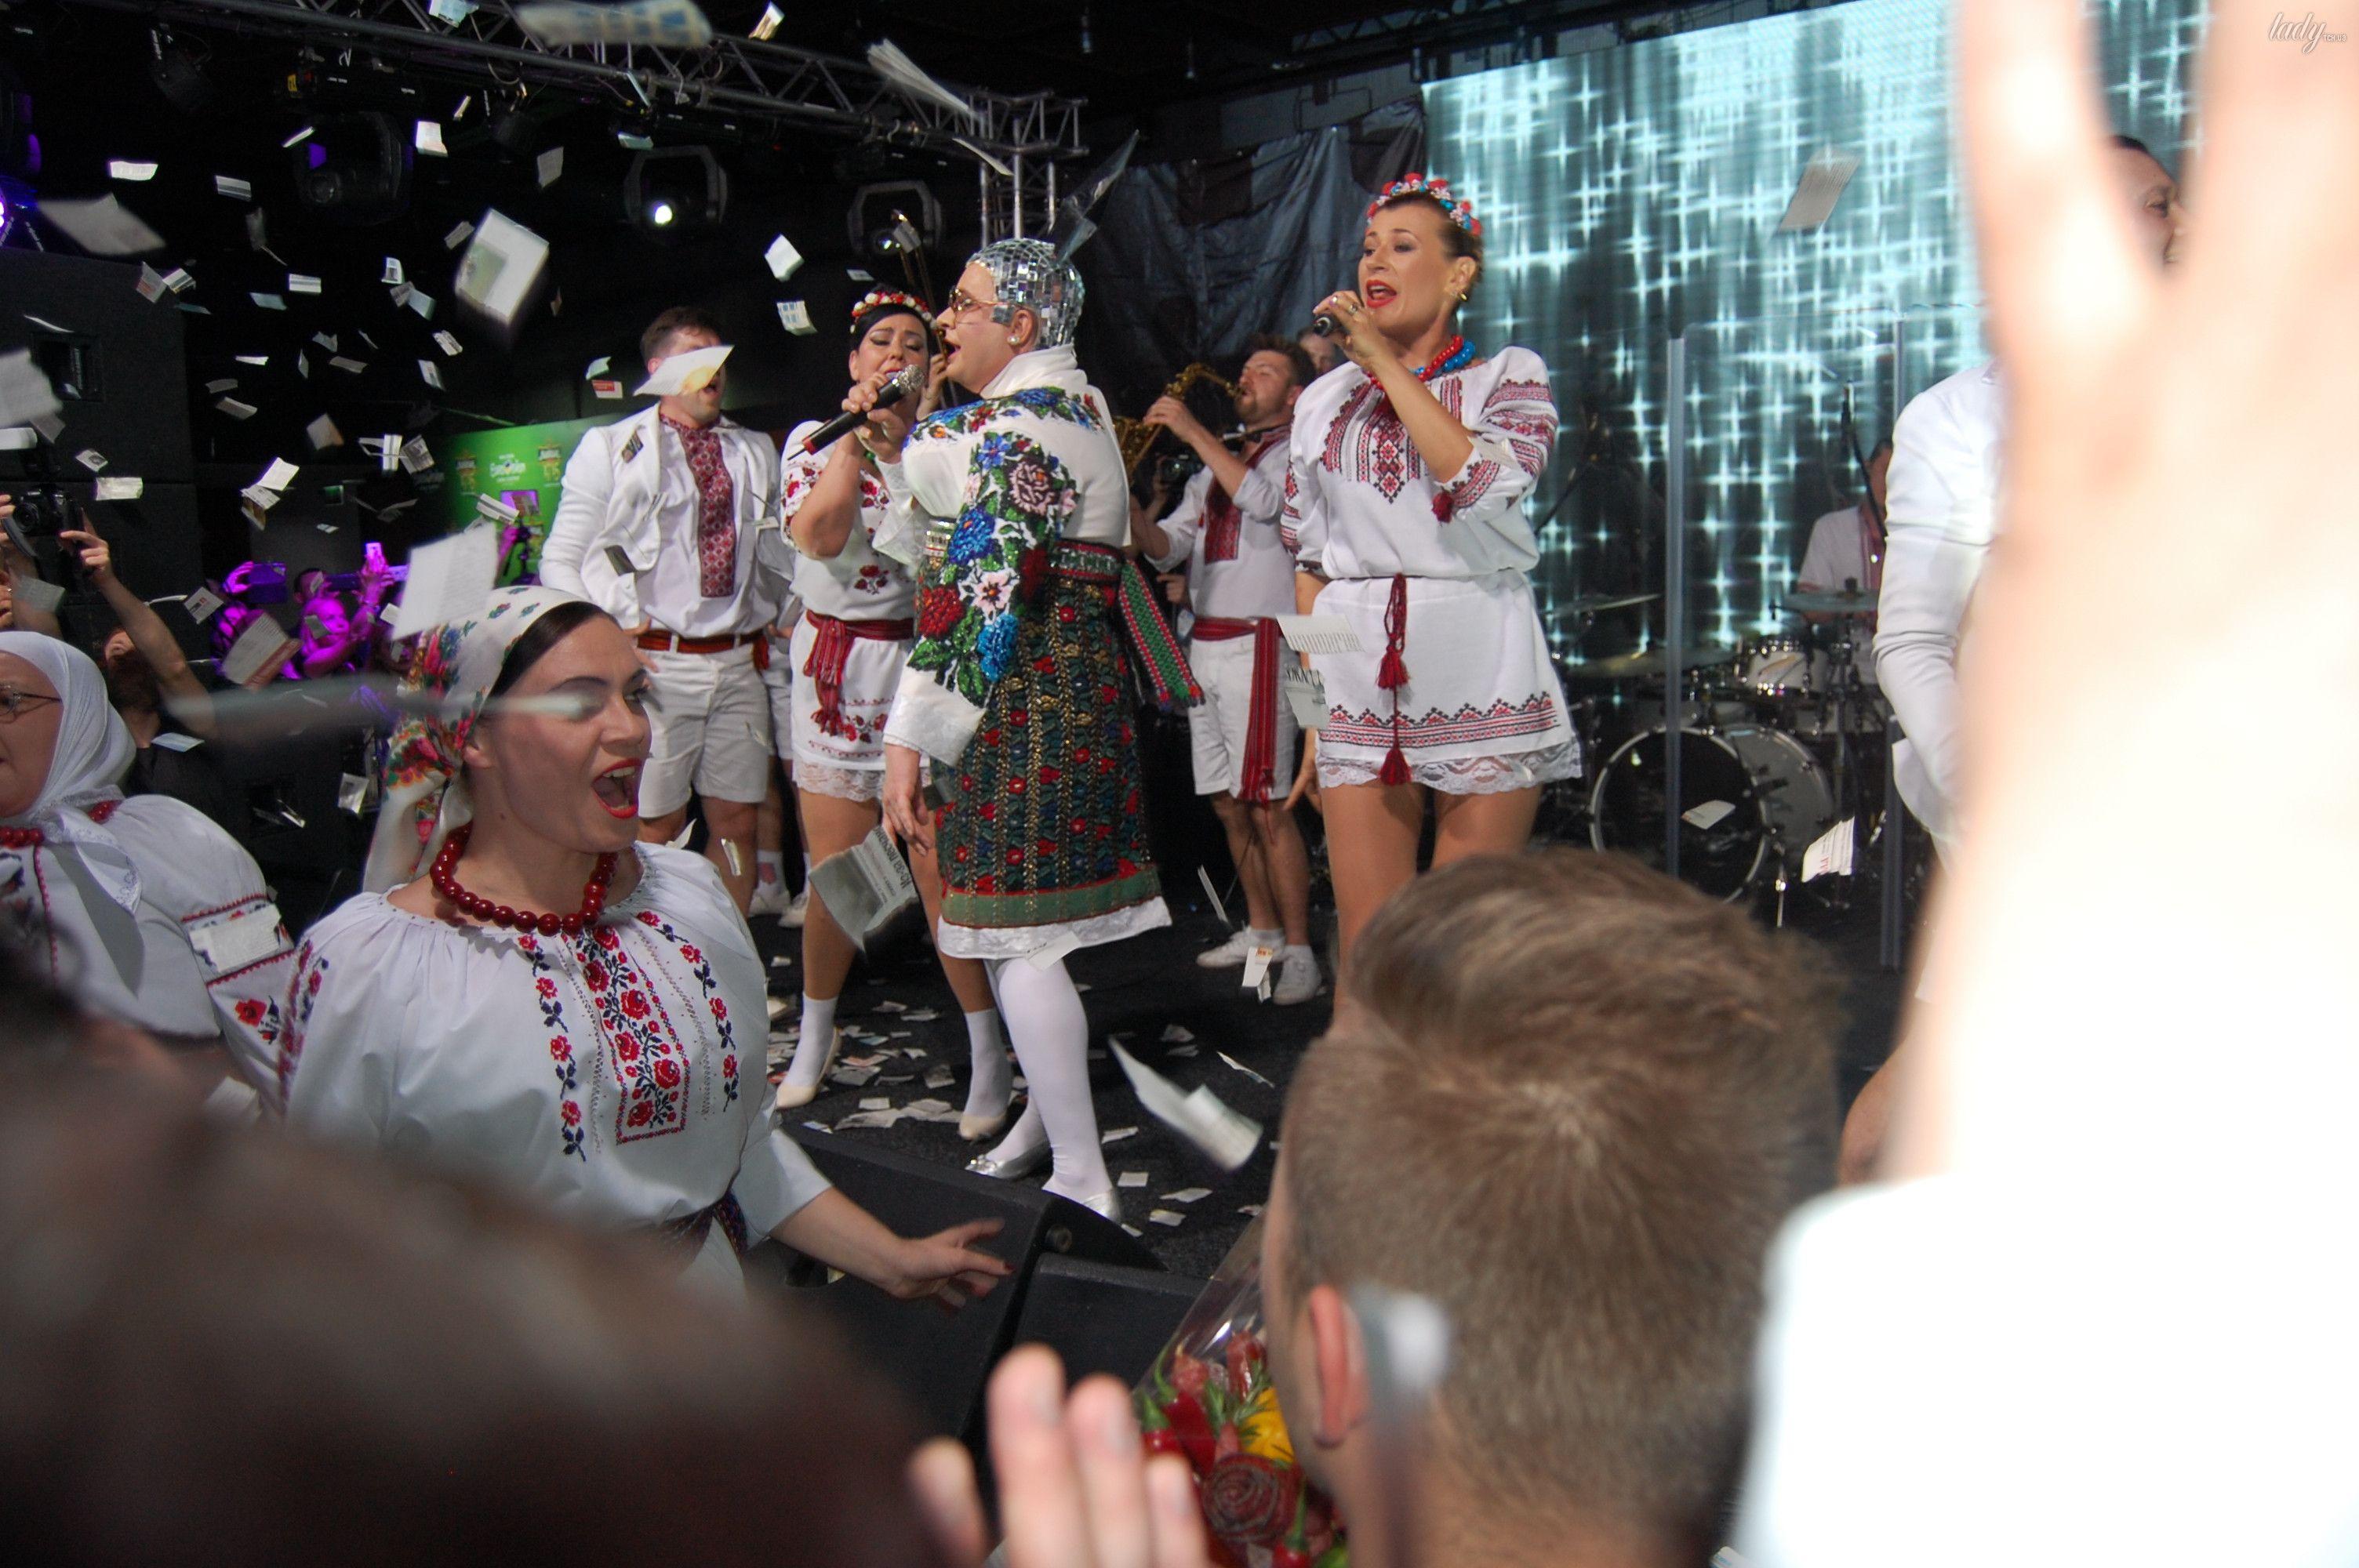 Верка Сердючка на вечеринке в EuroClub_2